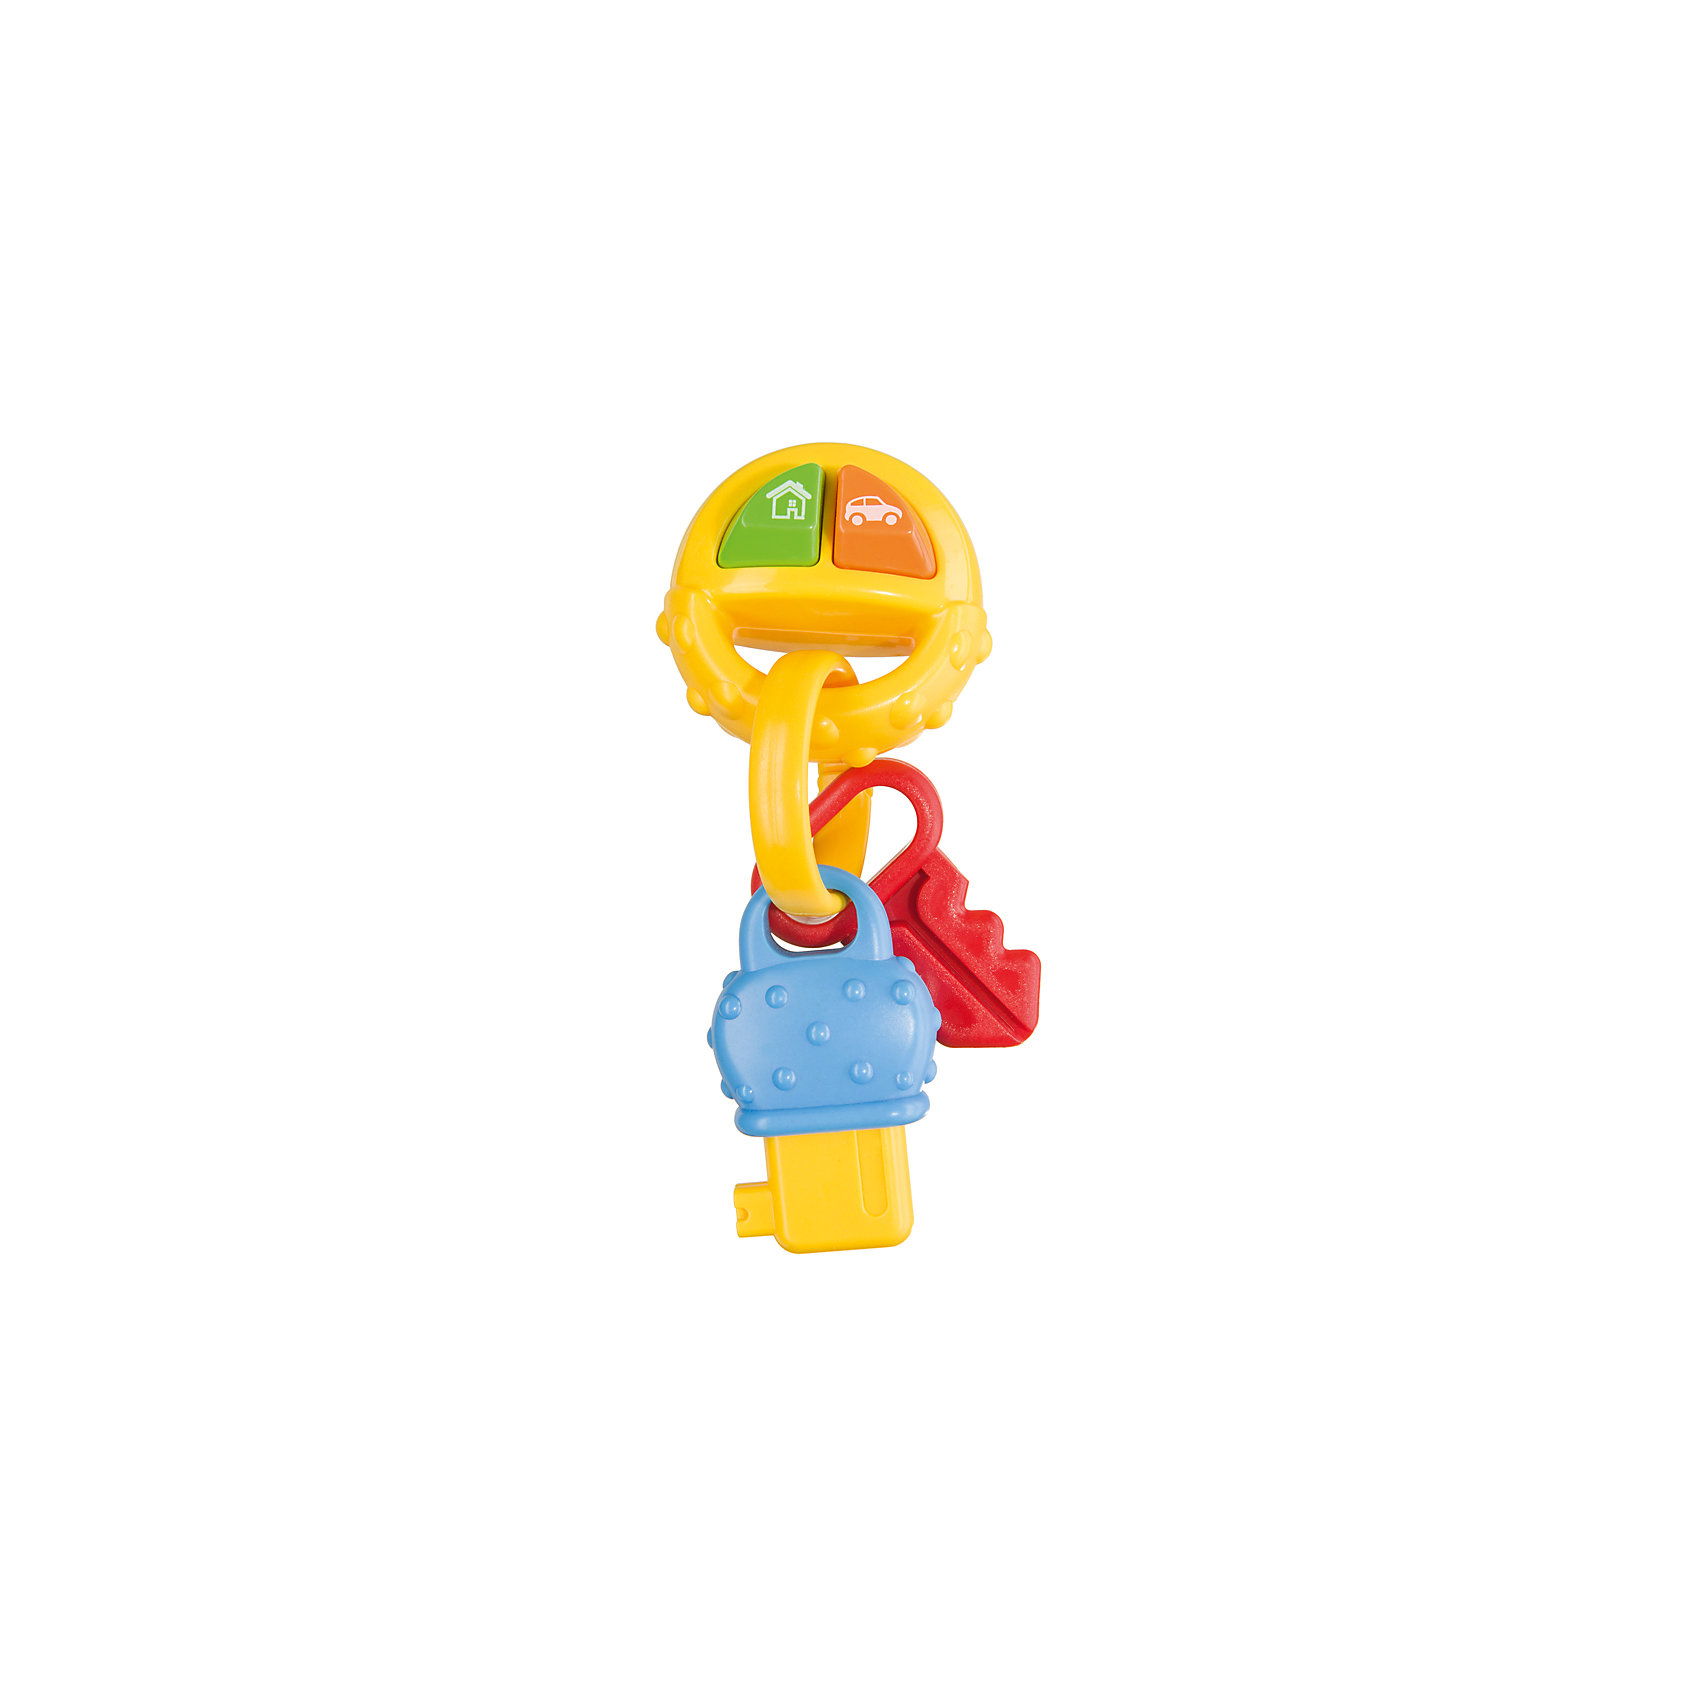 Игрушка PIP-PIP KEYS, Happy BabyРазвивающие игрушки<br><br><br>Ширина мм: 45<br>Глубина мм: 135<br>Высота мм: 235<br>Вес г: 90<br>Возраст от месяцев: 6<br>Возраст до месяцев: 36<br>Пол: Унисекс<br>Возраст: Детский<br>SKU: 5345693